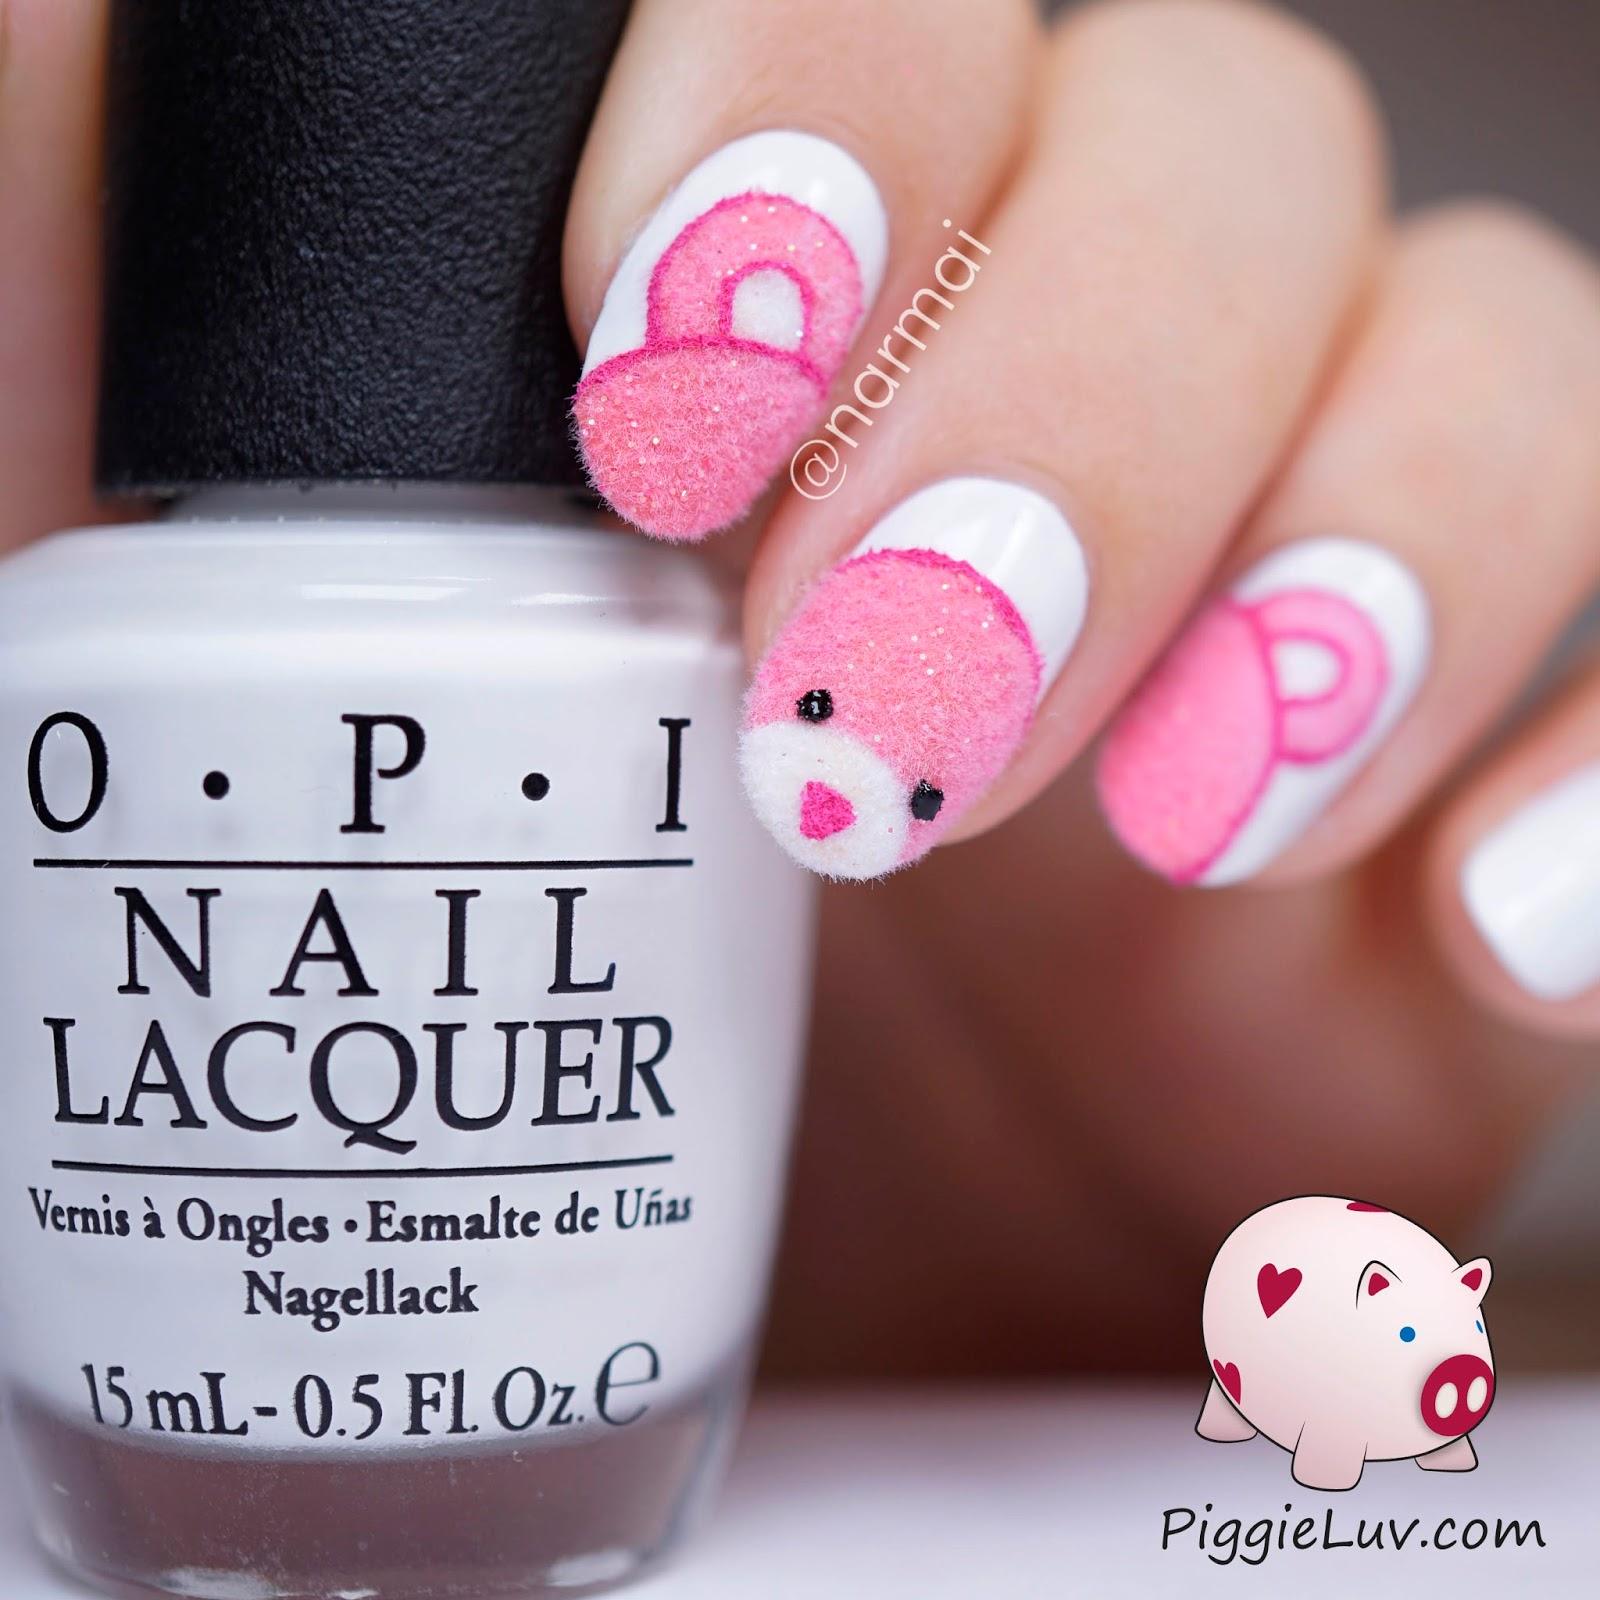 PiggieLuv: Fuzzy pink teddy bear nail art